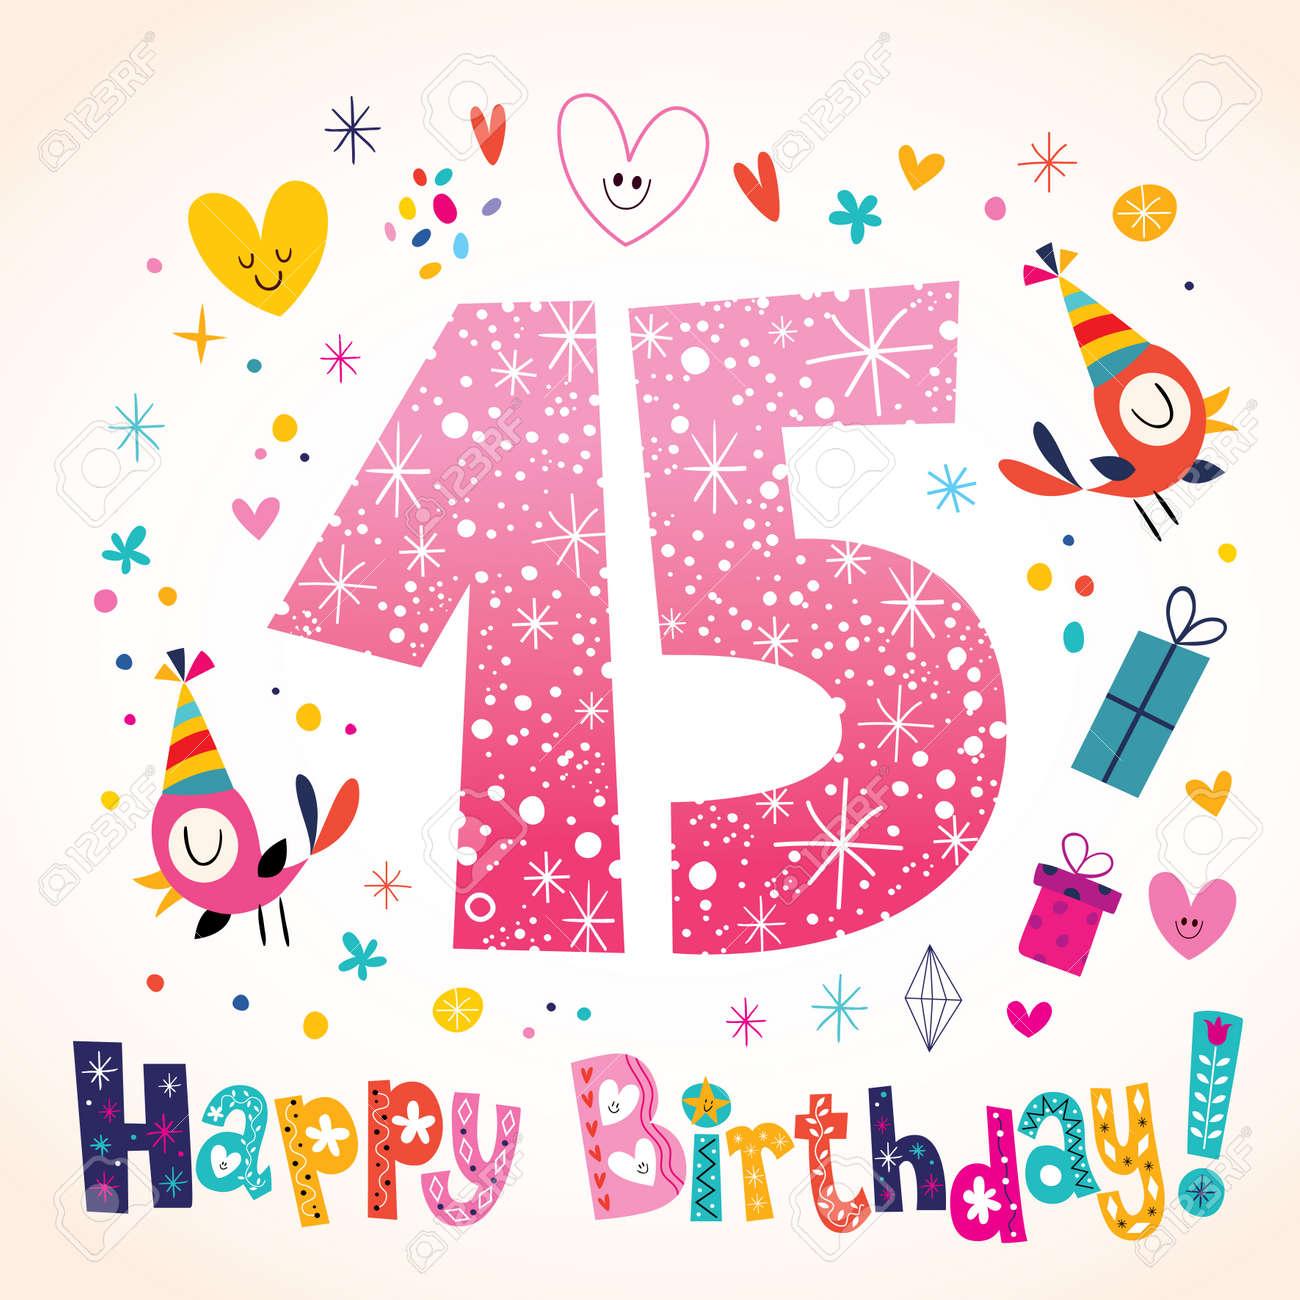 Happy birthday 15 years kids greeting card royalty free cliparts happy birthday 15 years kids greeting card stock vector 55590309 m4hsunfo